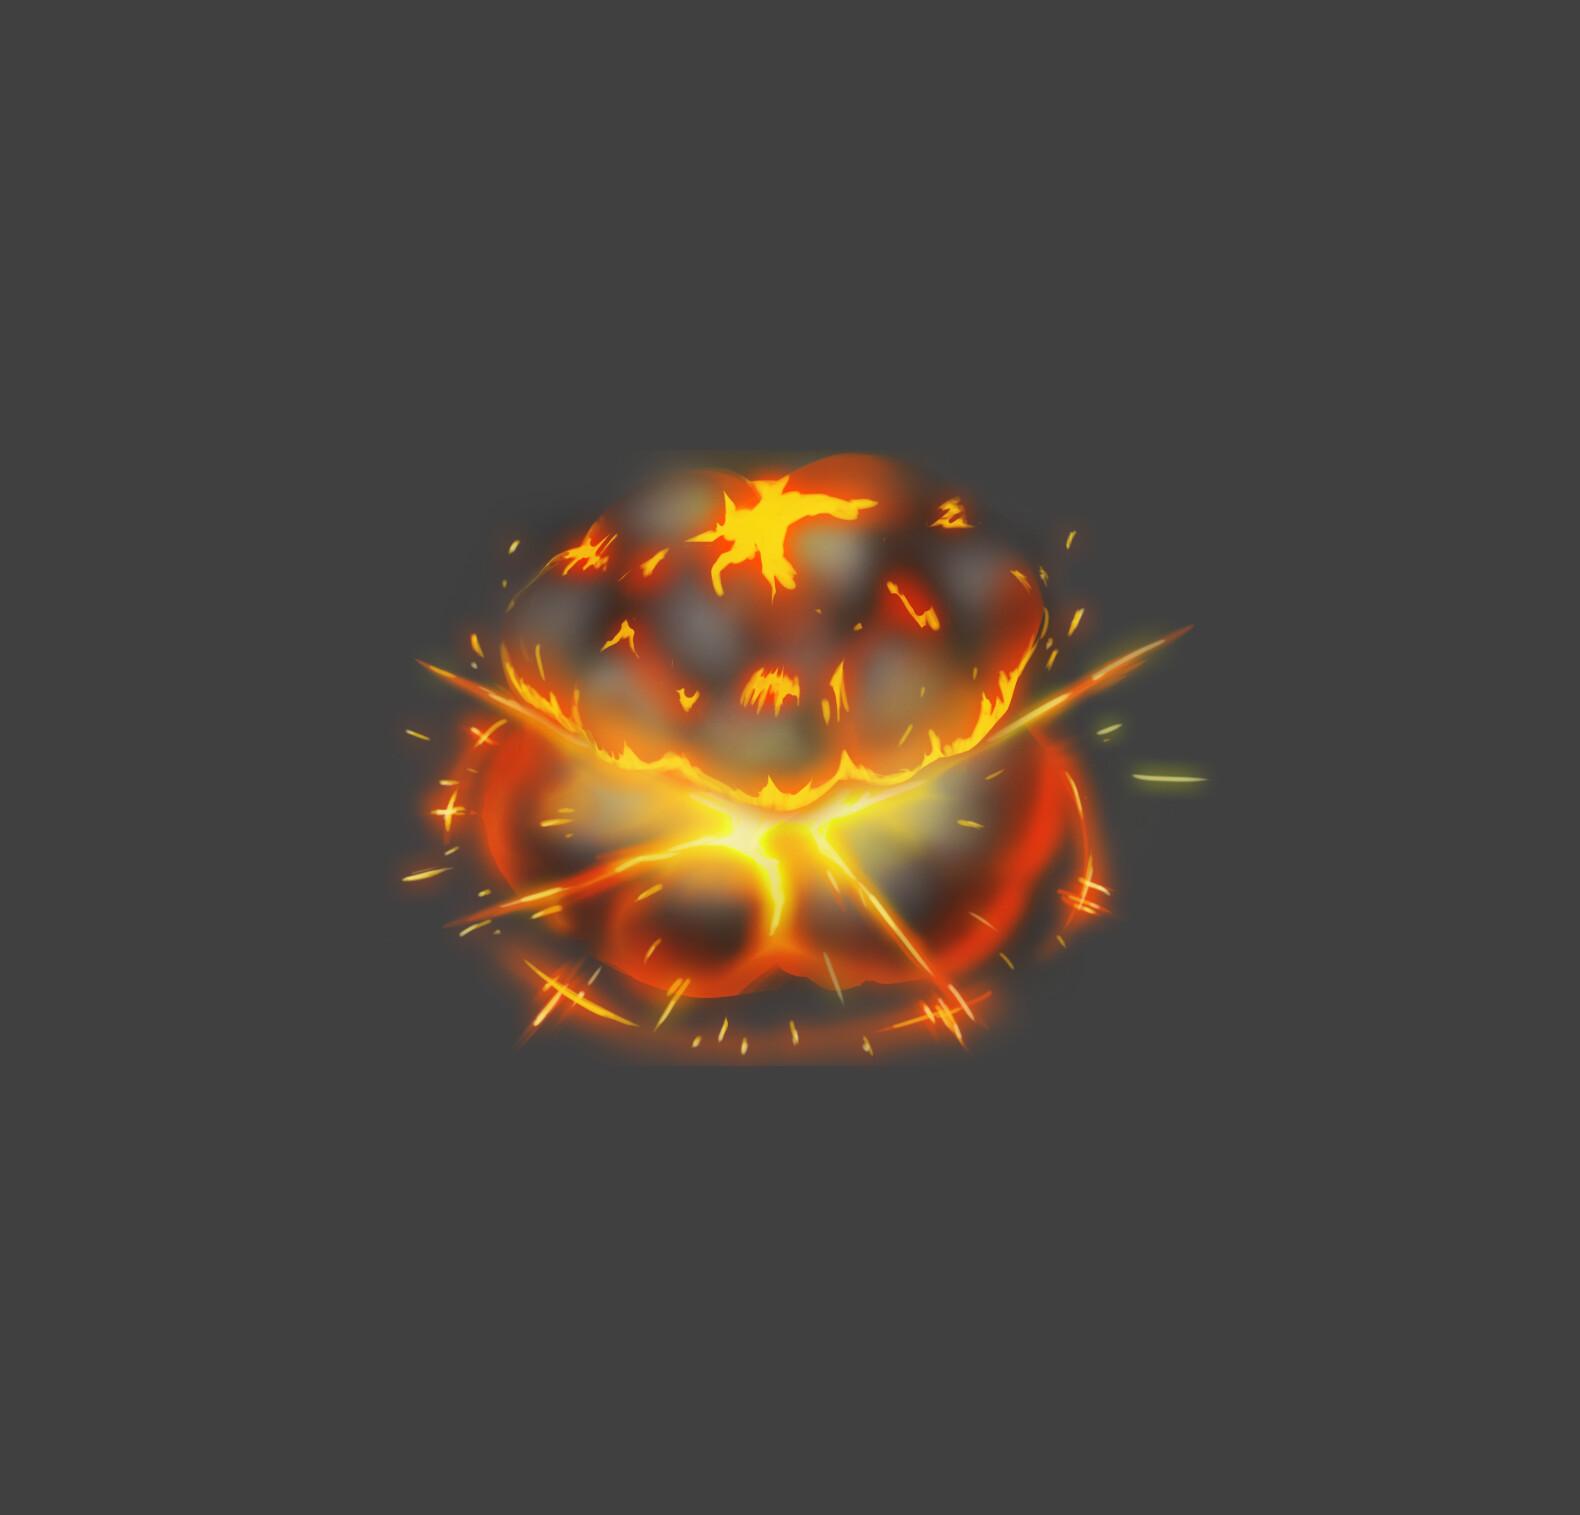 Fire Explosion FX Concept